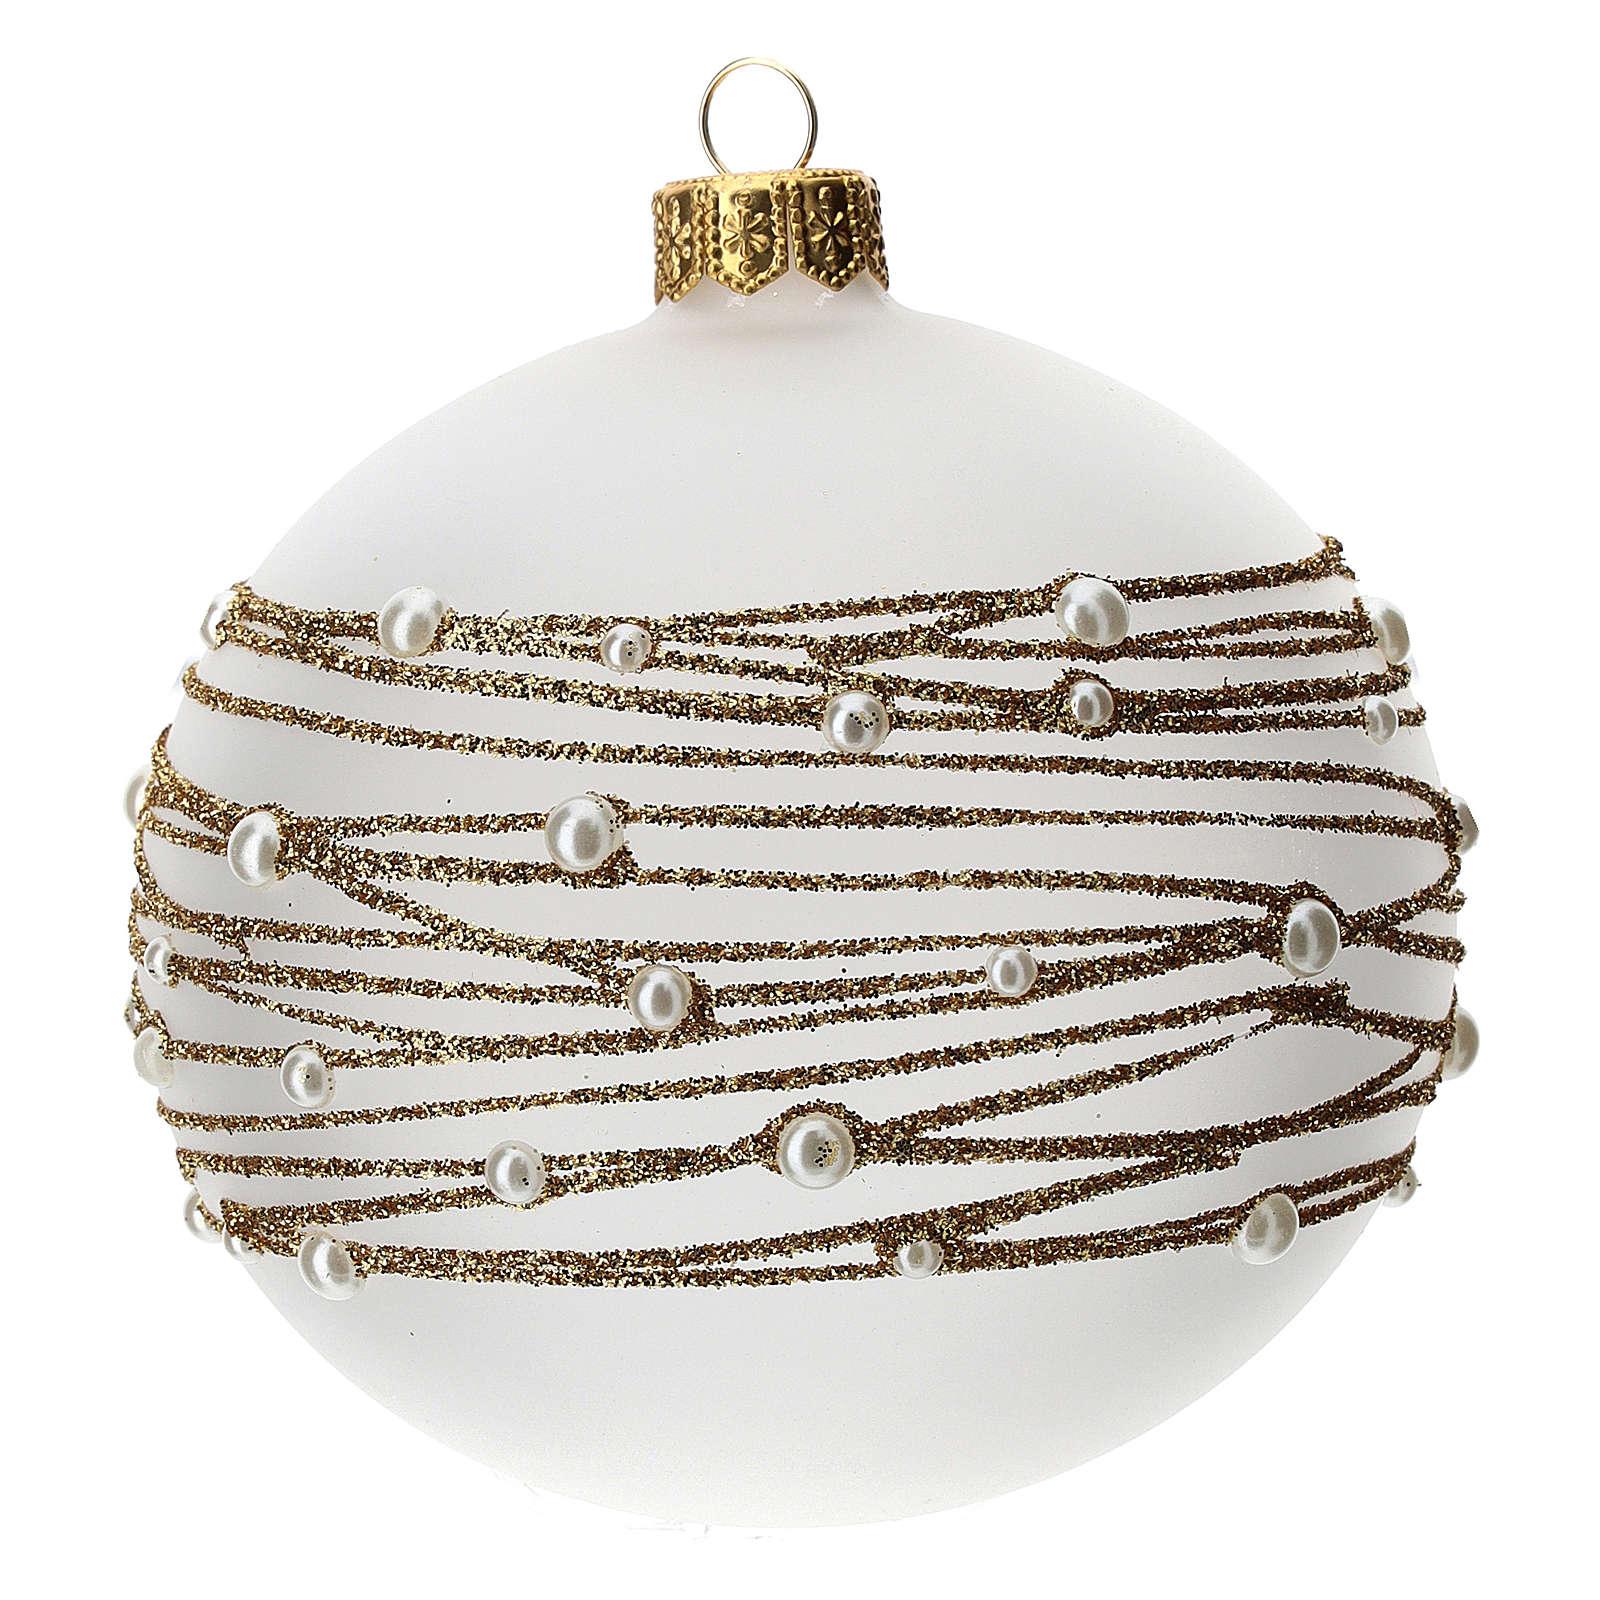 Bola árbol Navidad vidrio soplado opaca motivo bordado dorado 100 mm 4